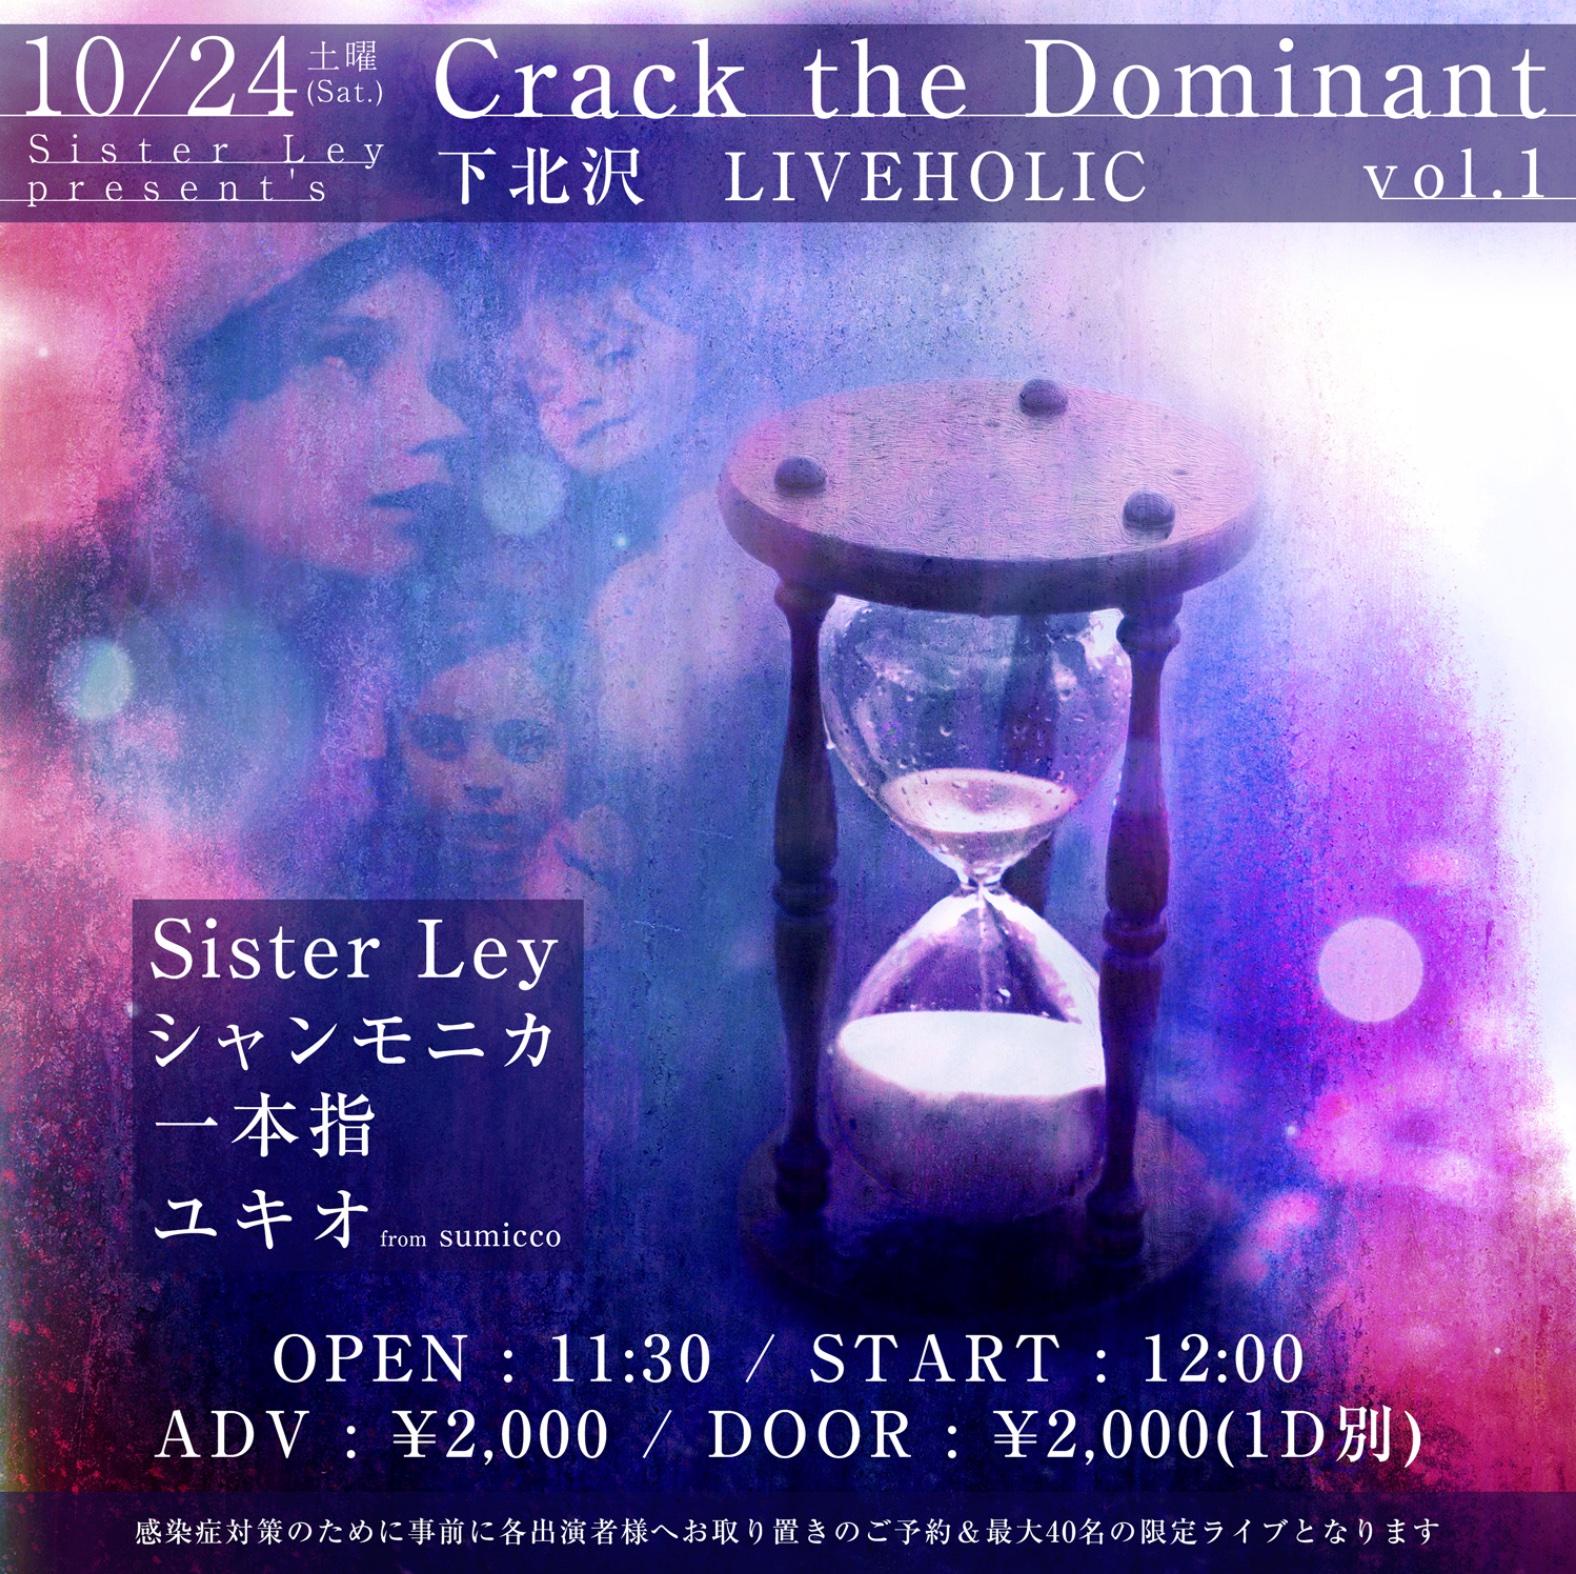 Sister Ley presents Crack the Dominant Vol.1